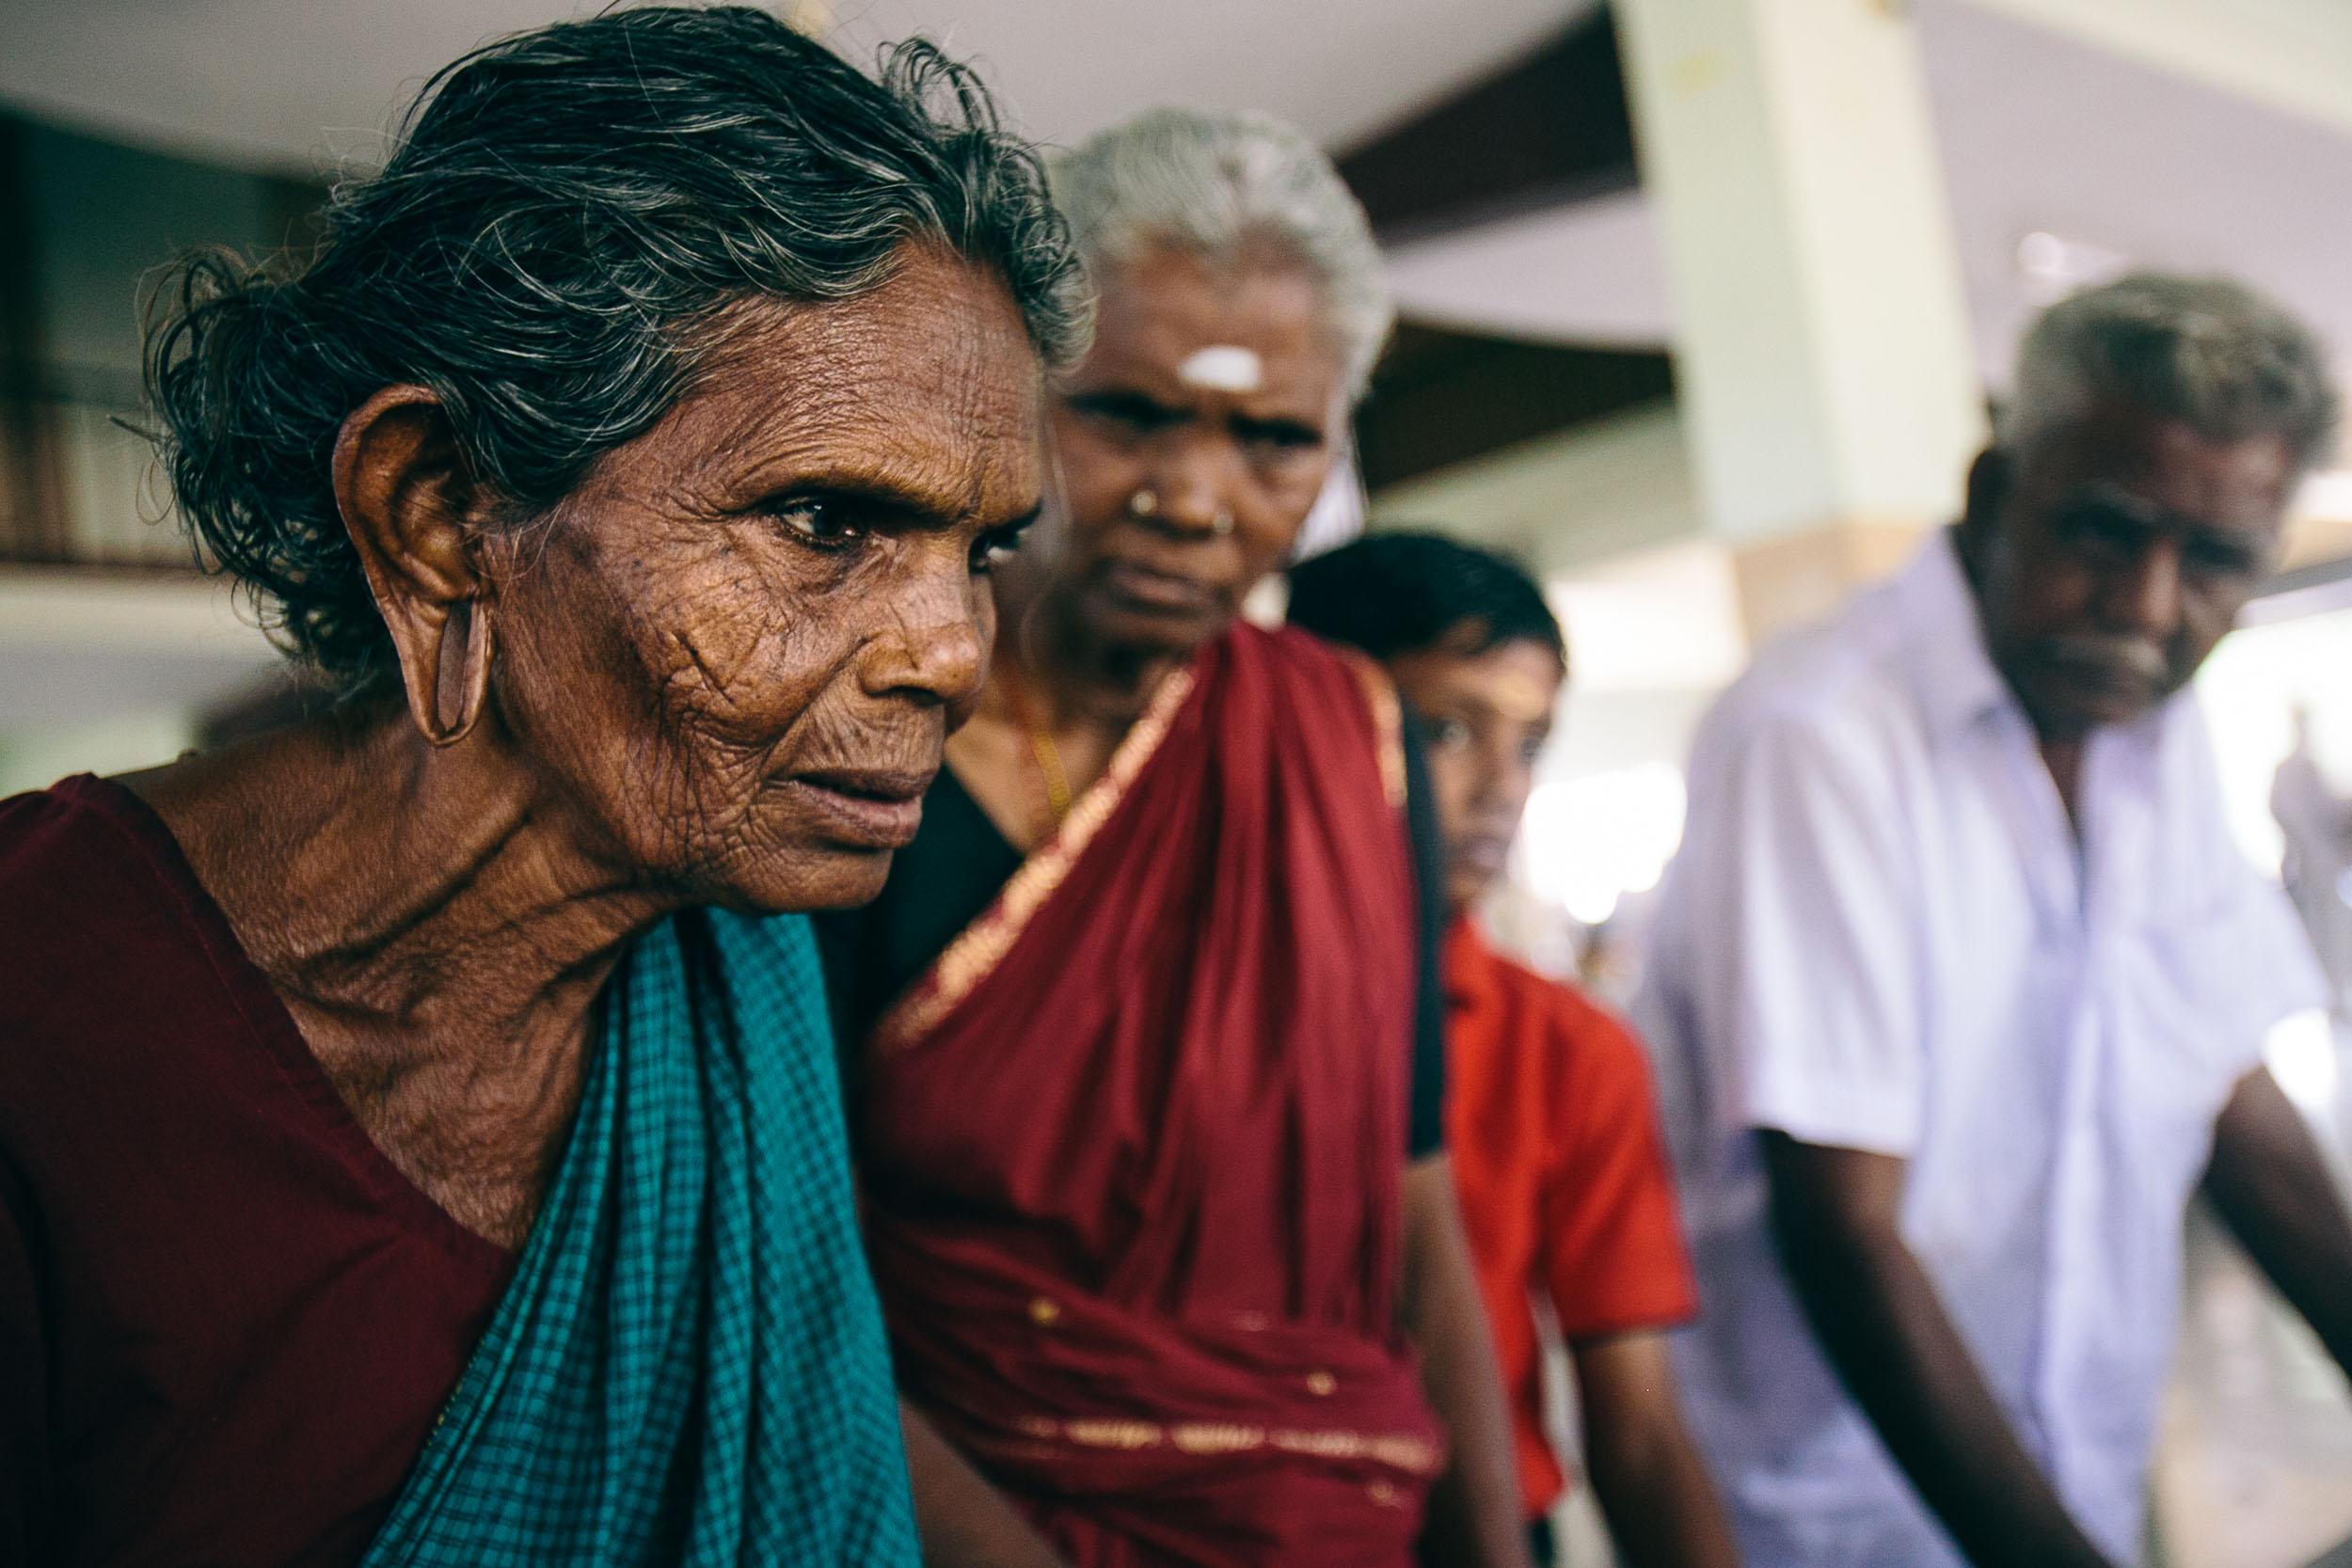 brian-callaway-india-photography-aravind-eye-hospital-10.jpg